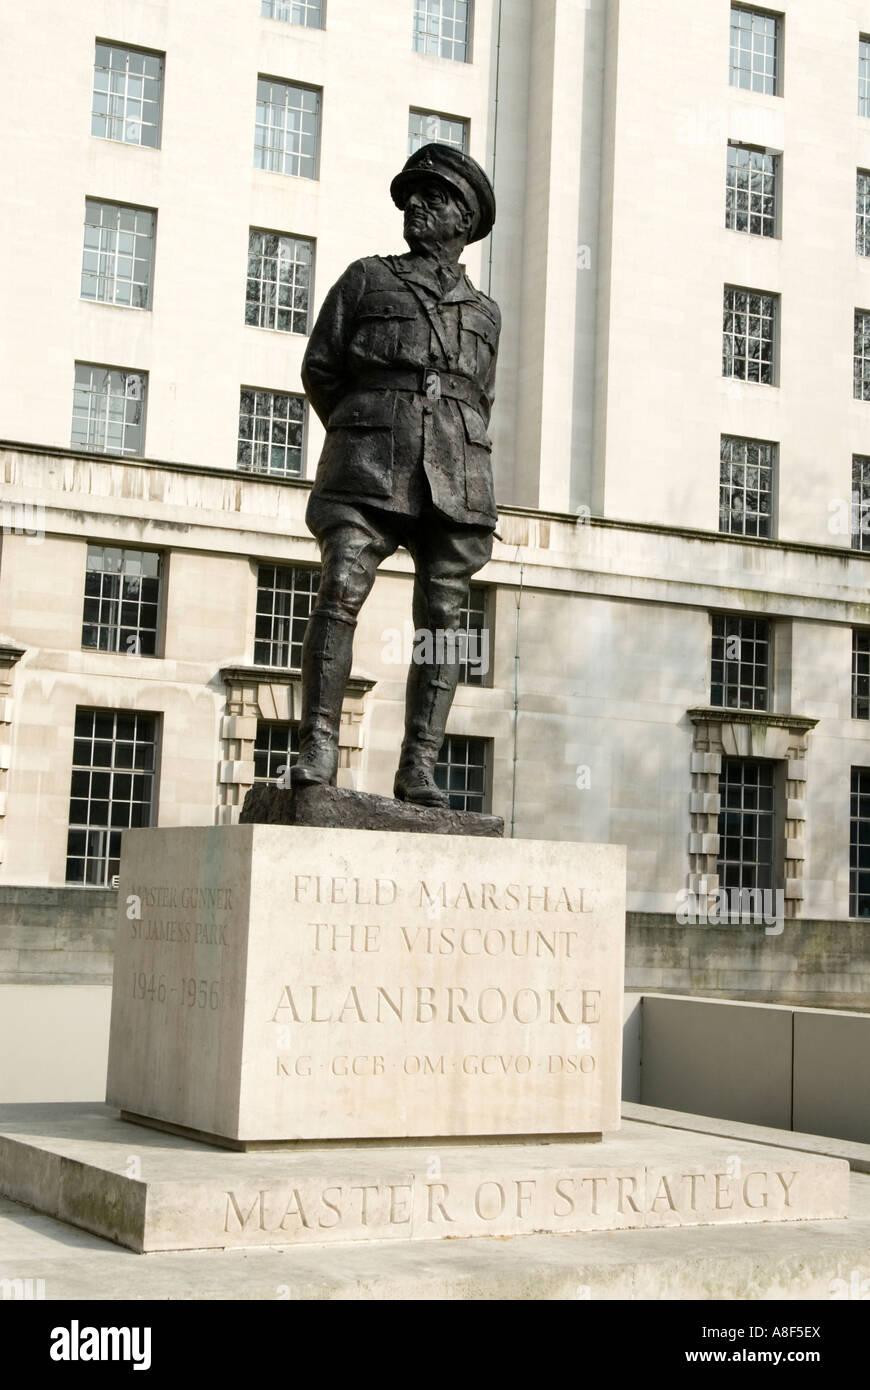 Statue of Field Marshall Alan Brooke on Whitehall London England UK - Stock Image